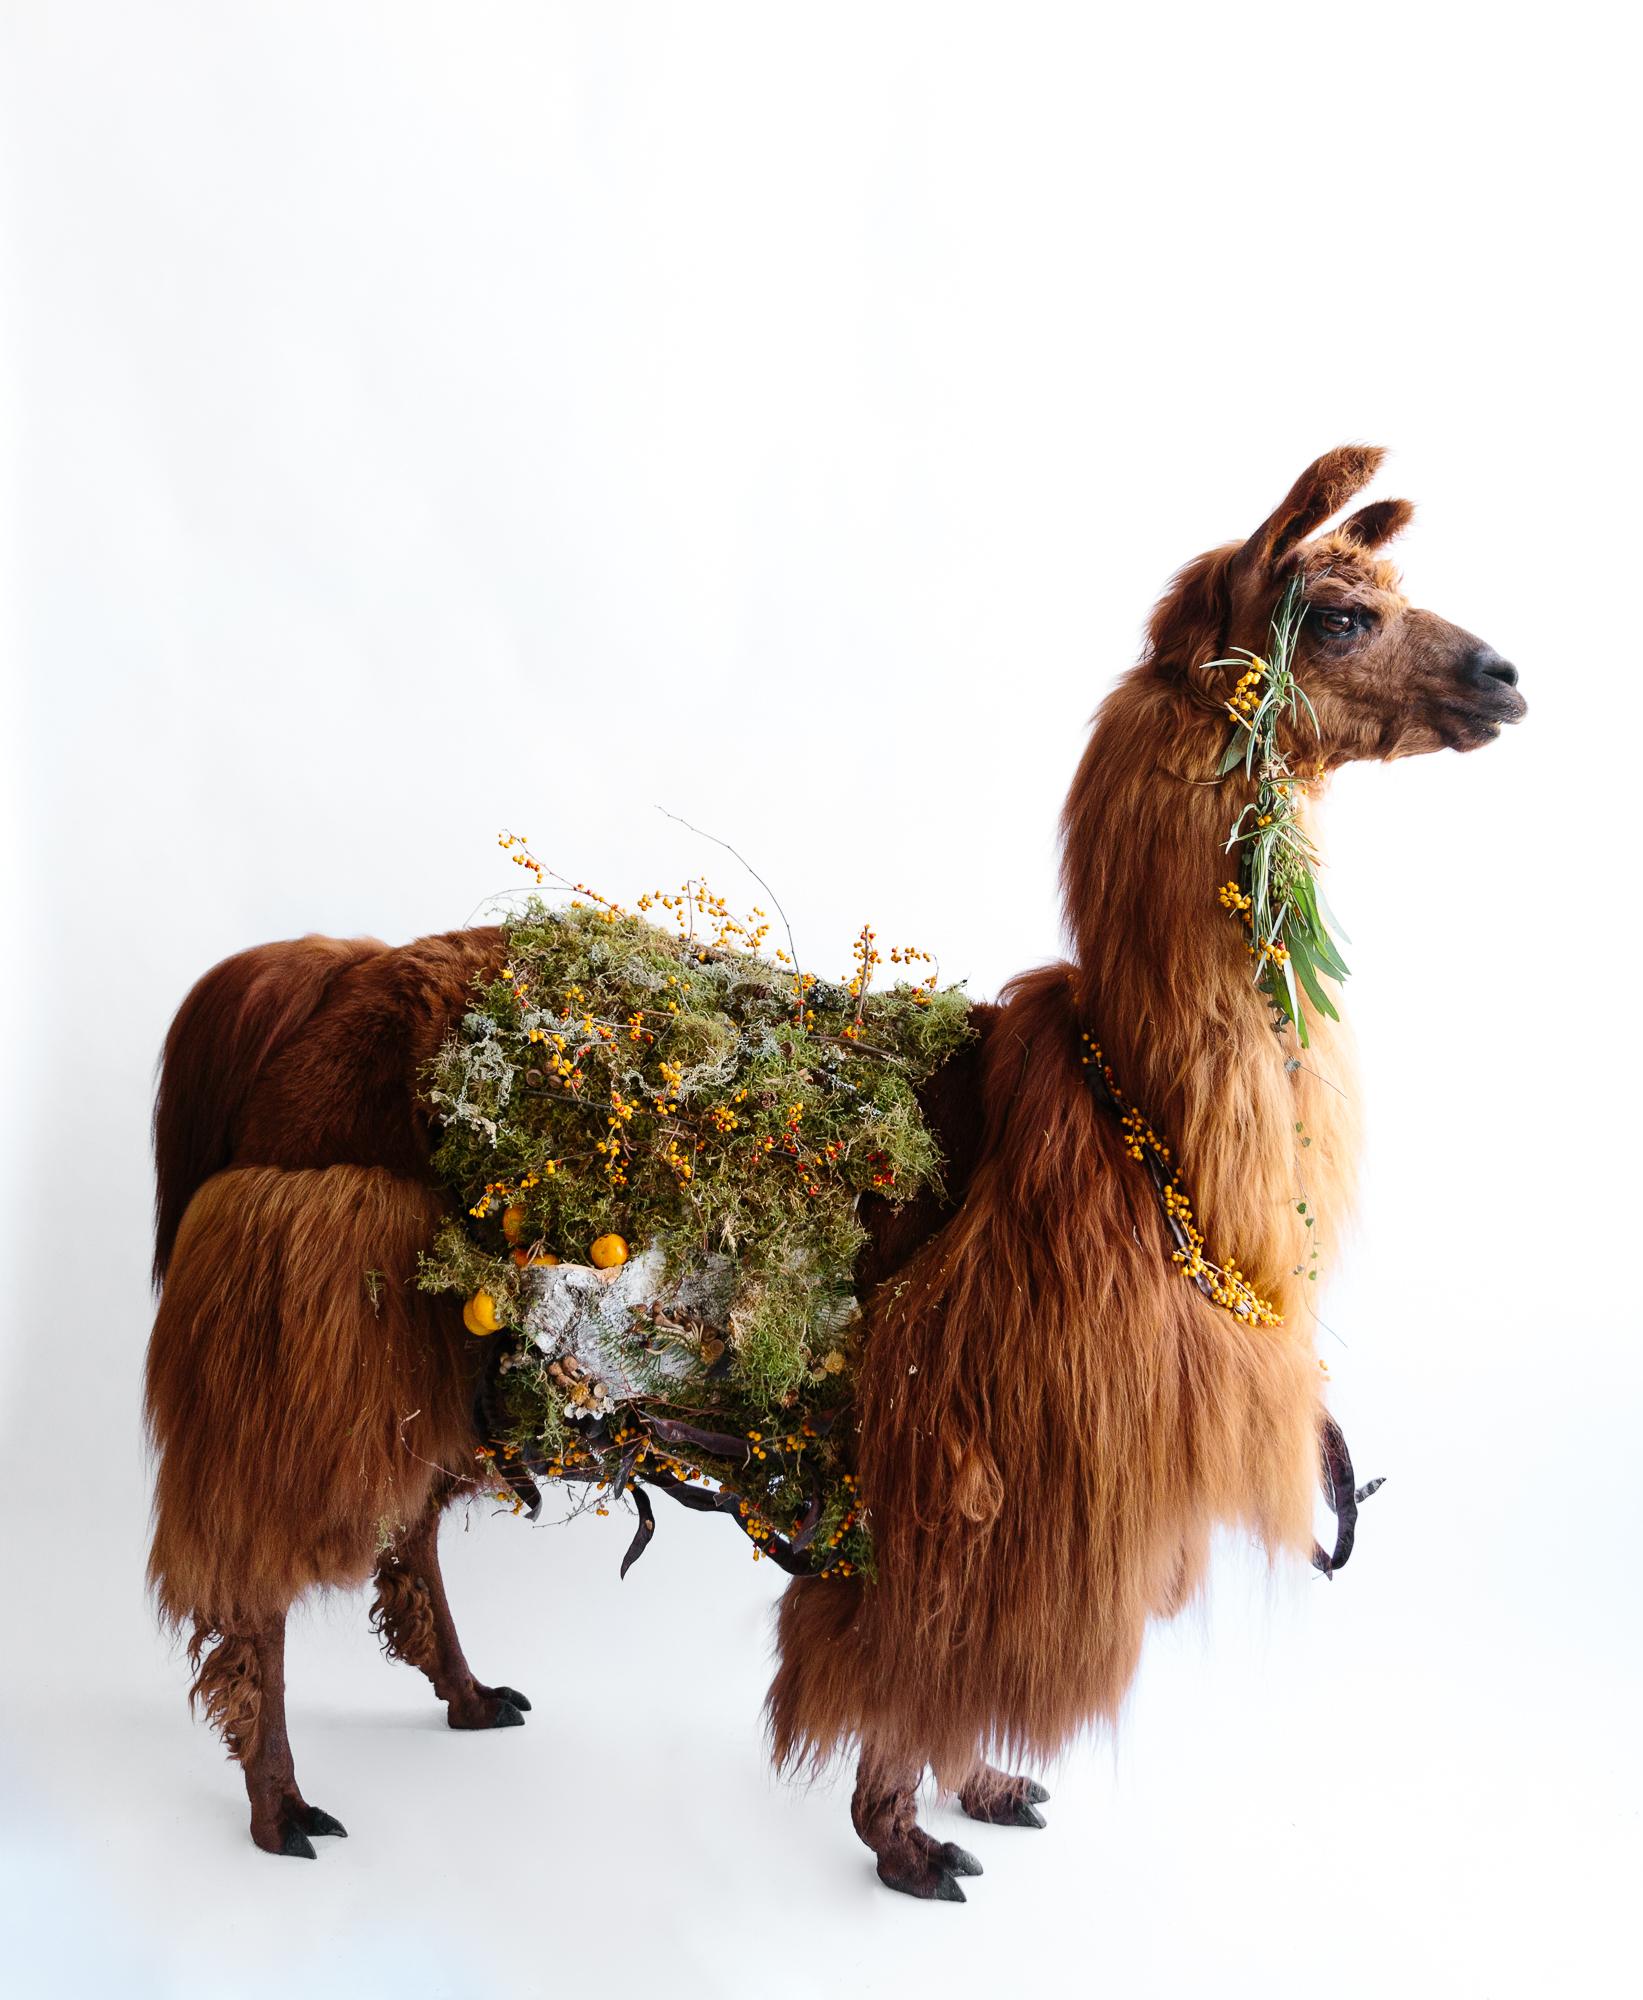 llama_portland_animal-4.JPG